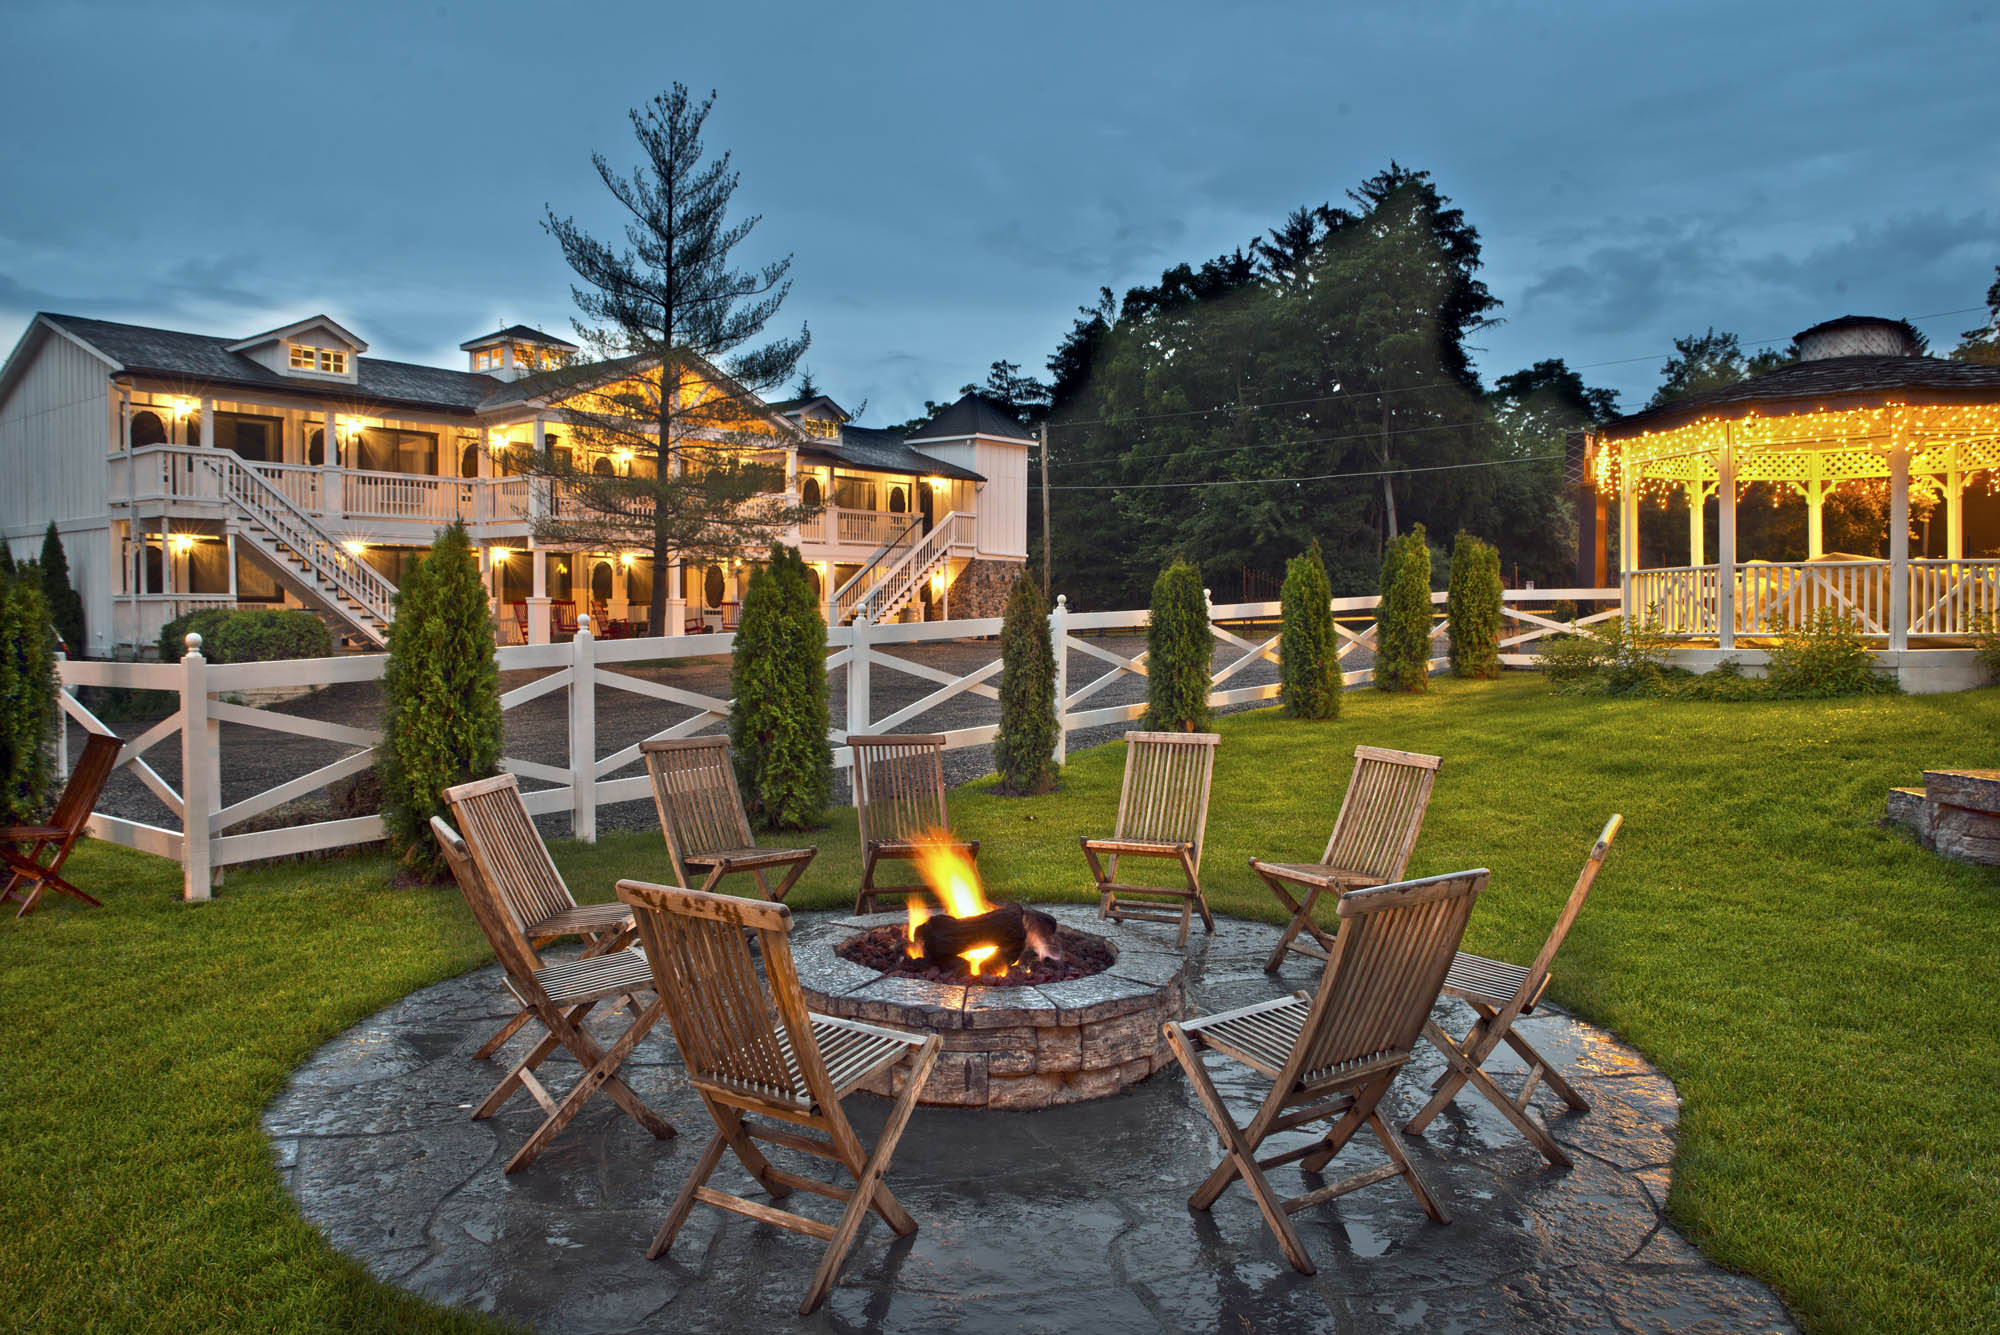 Maxwell Mansion Hotel 6 Exterior Mews Fire Lake Geneva Wisconsin 2.jpg